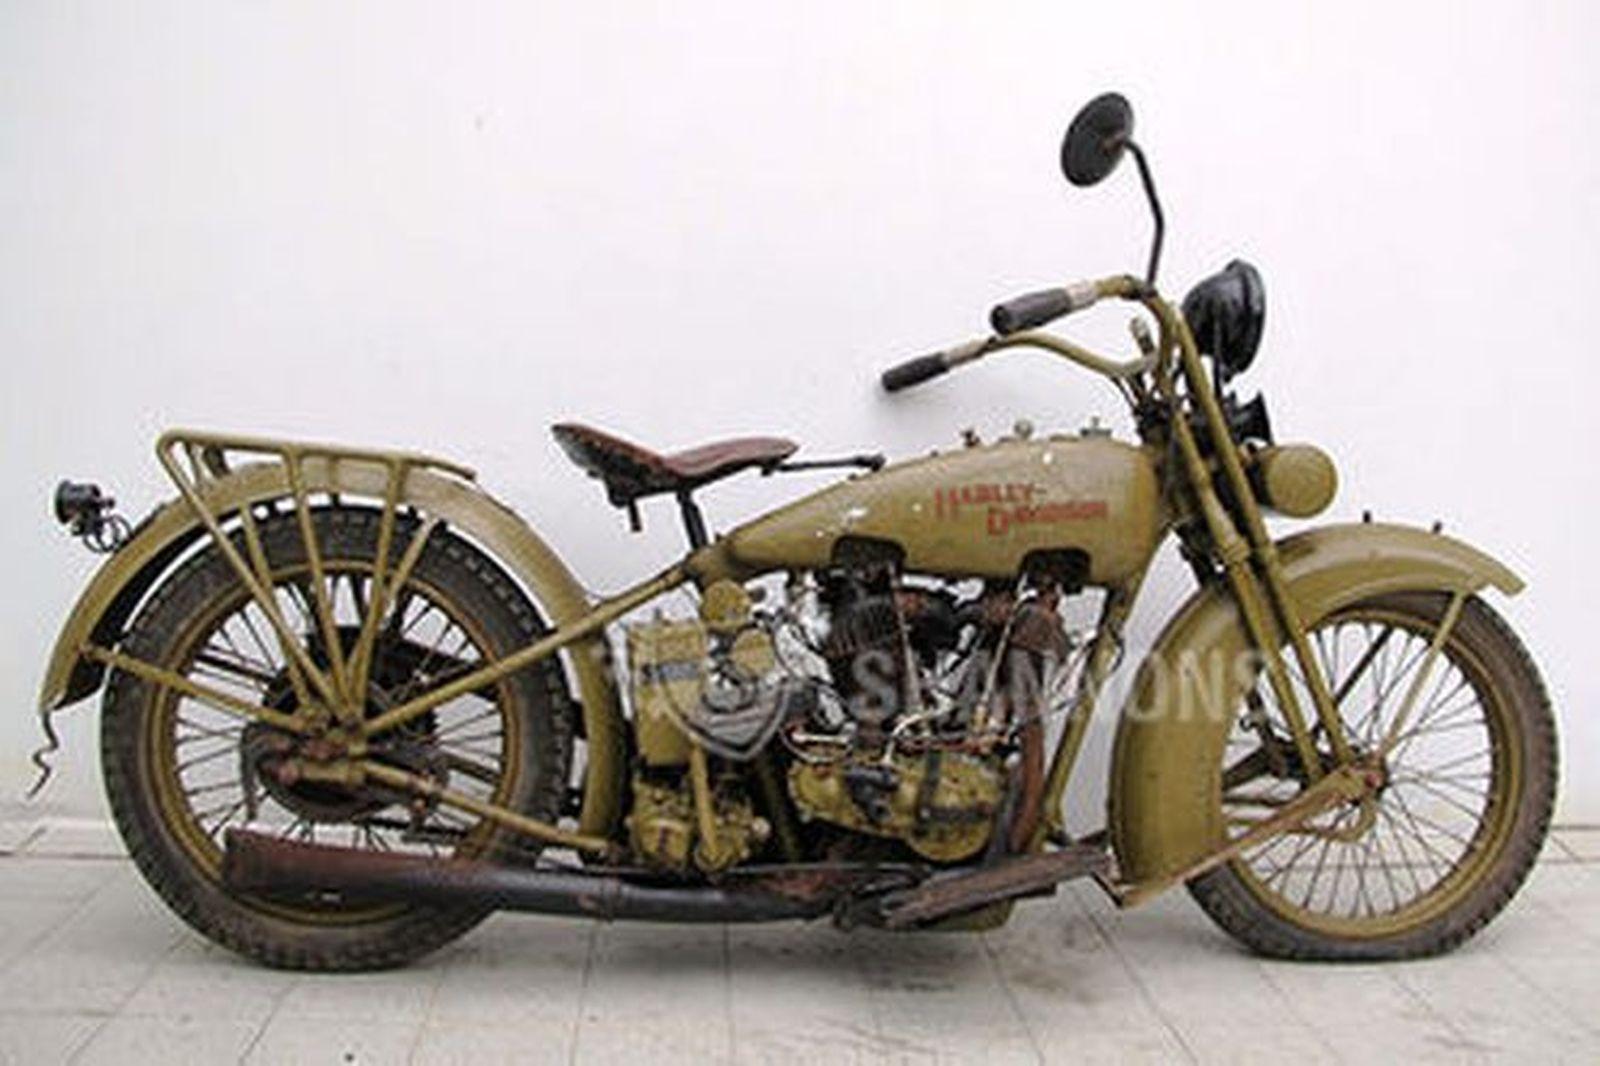 sold harley davidson j model 1000cc motorcycle auctions lot o shannons. Black Bedroom Furniture Sets. Home Design Ideas